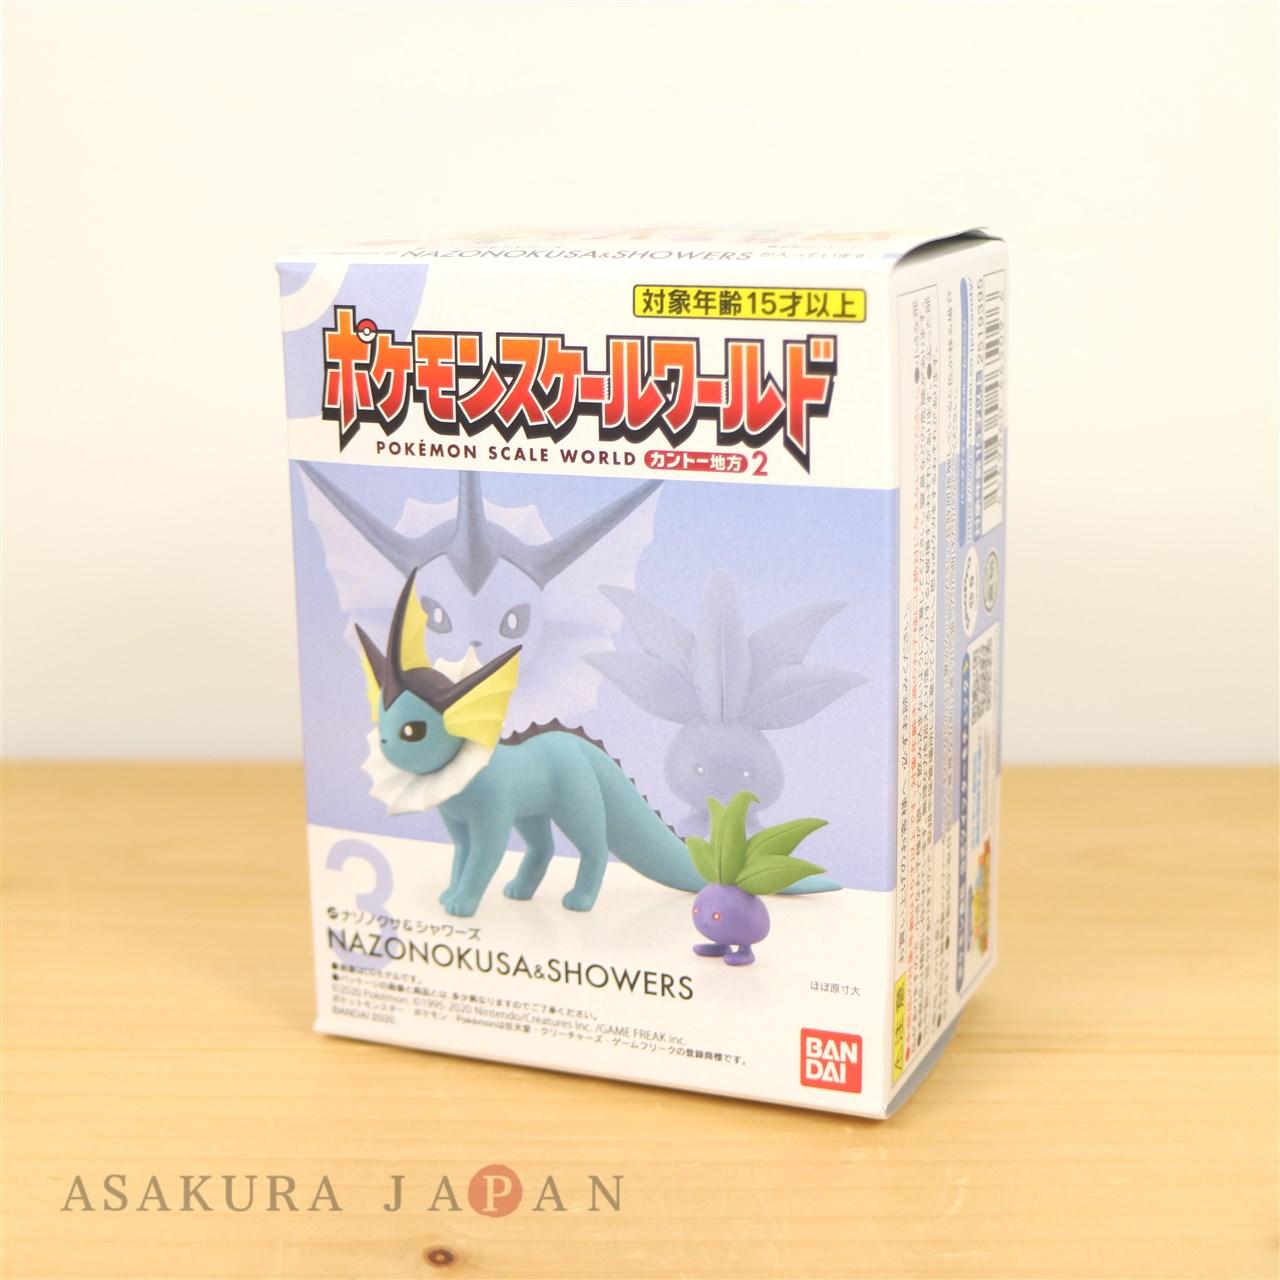 Pokemon Scale World Figure BANDAI Oddish Japan /& Vaporeon Nazonokusa Showers